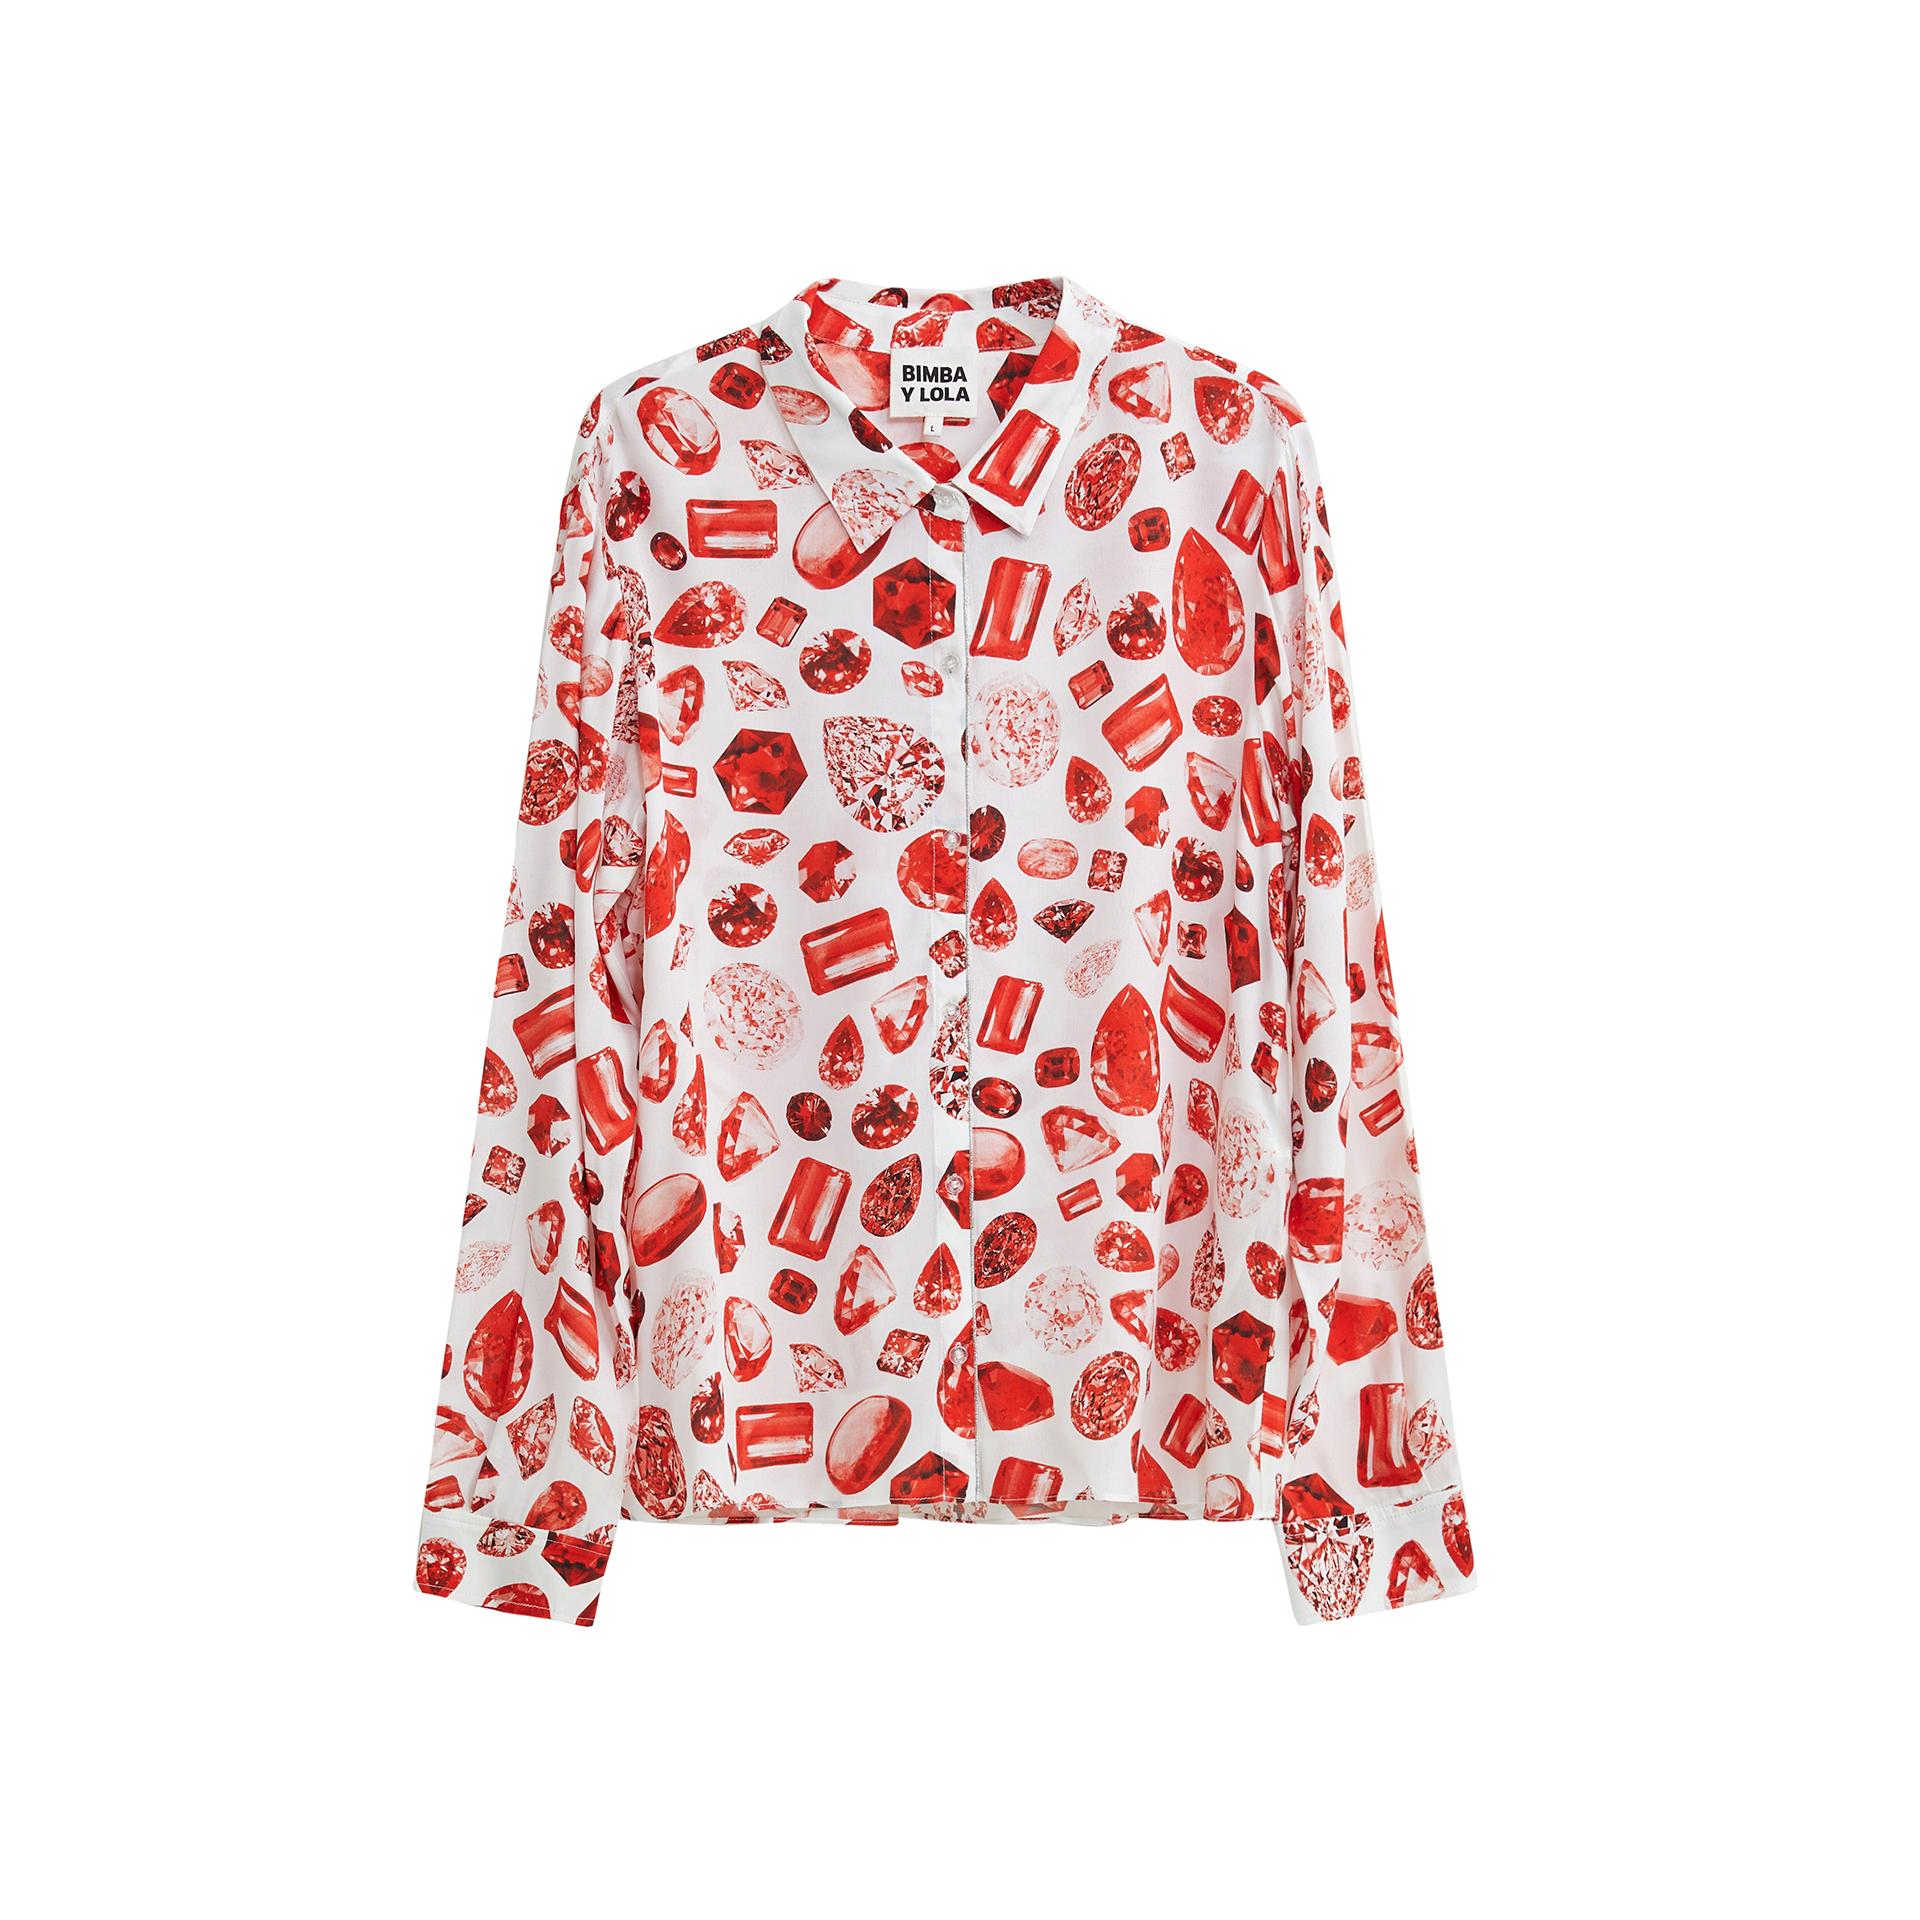 Valentine's Print Shirt, $227